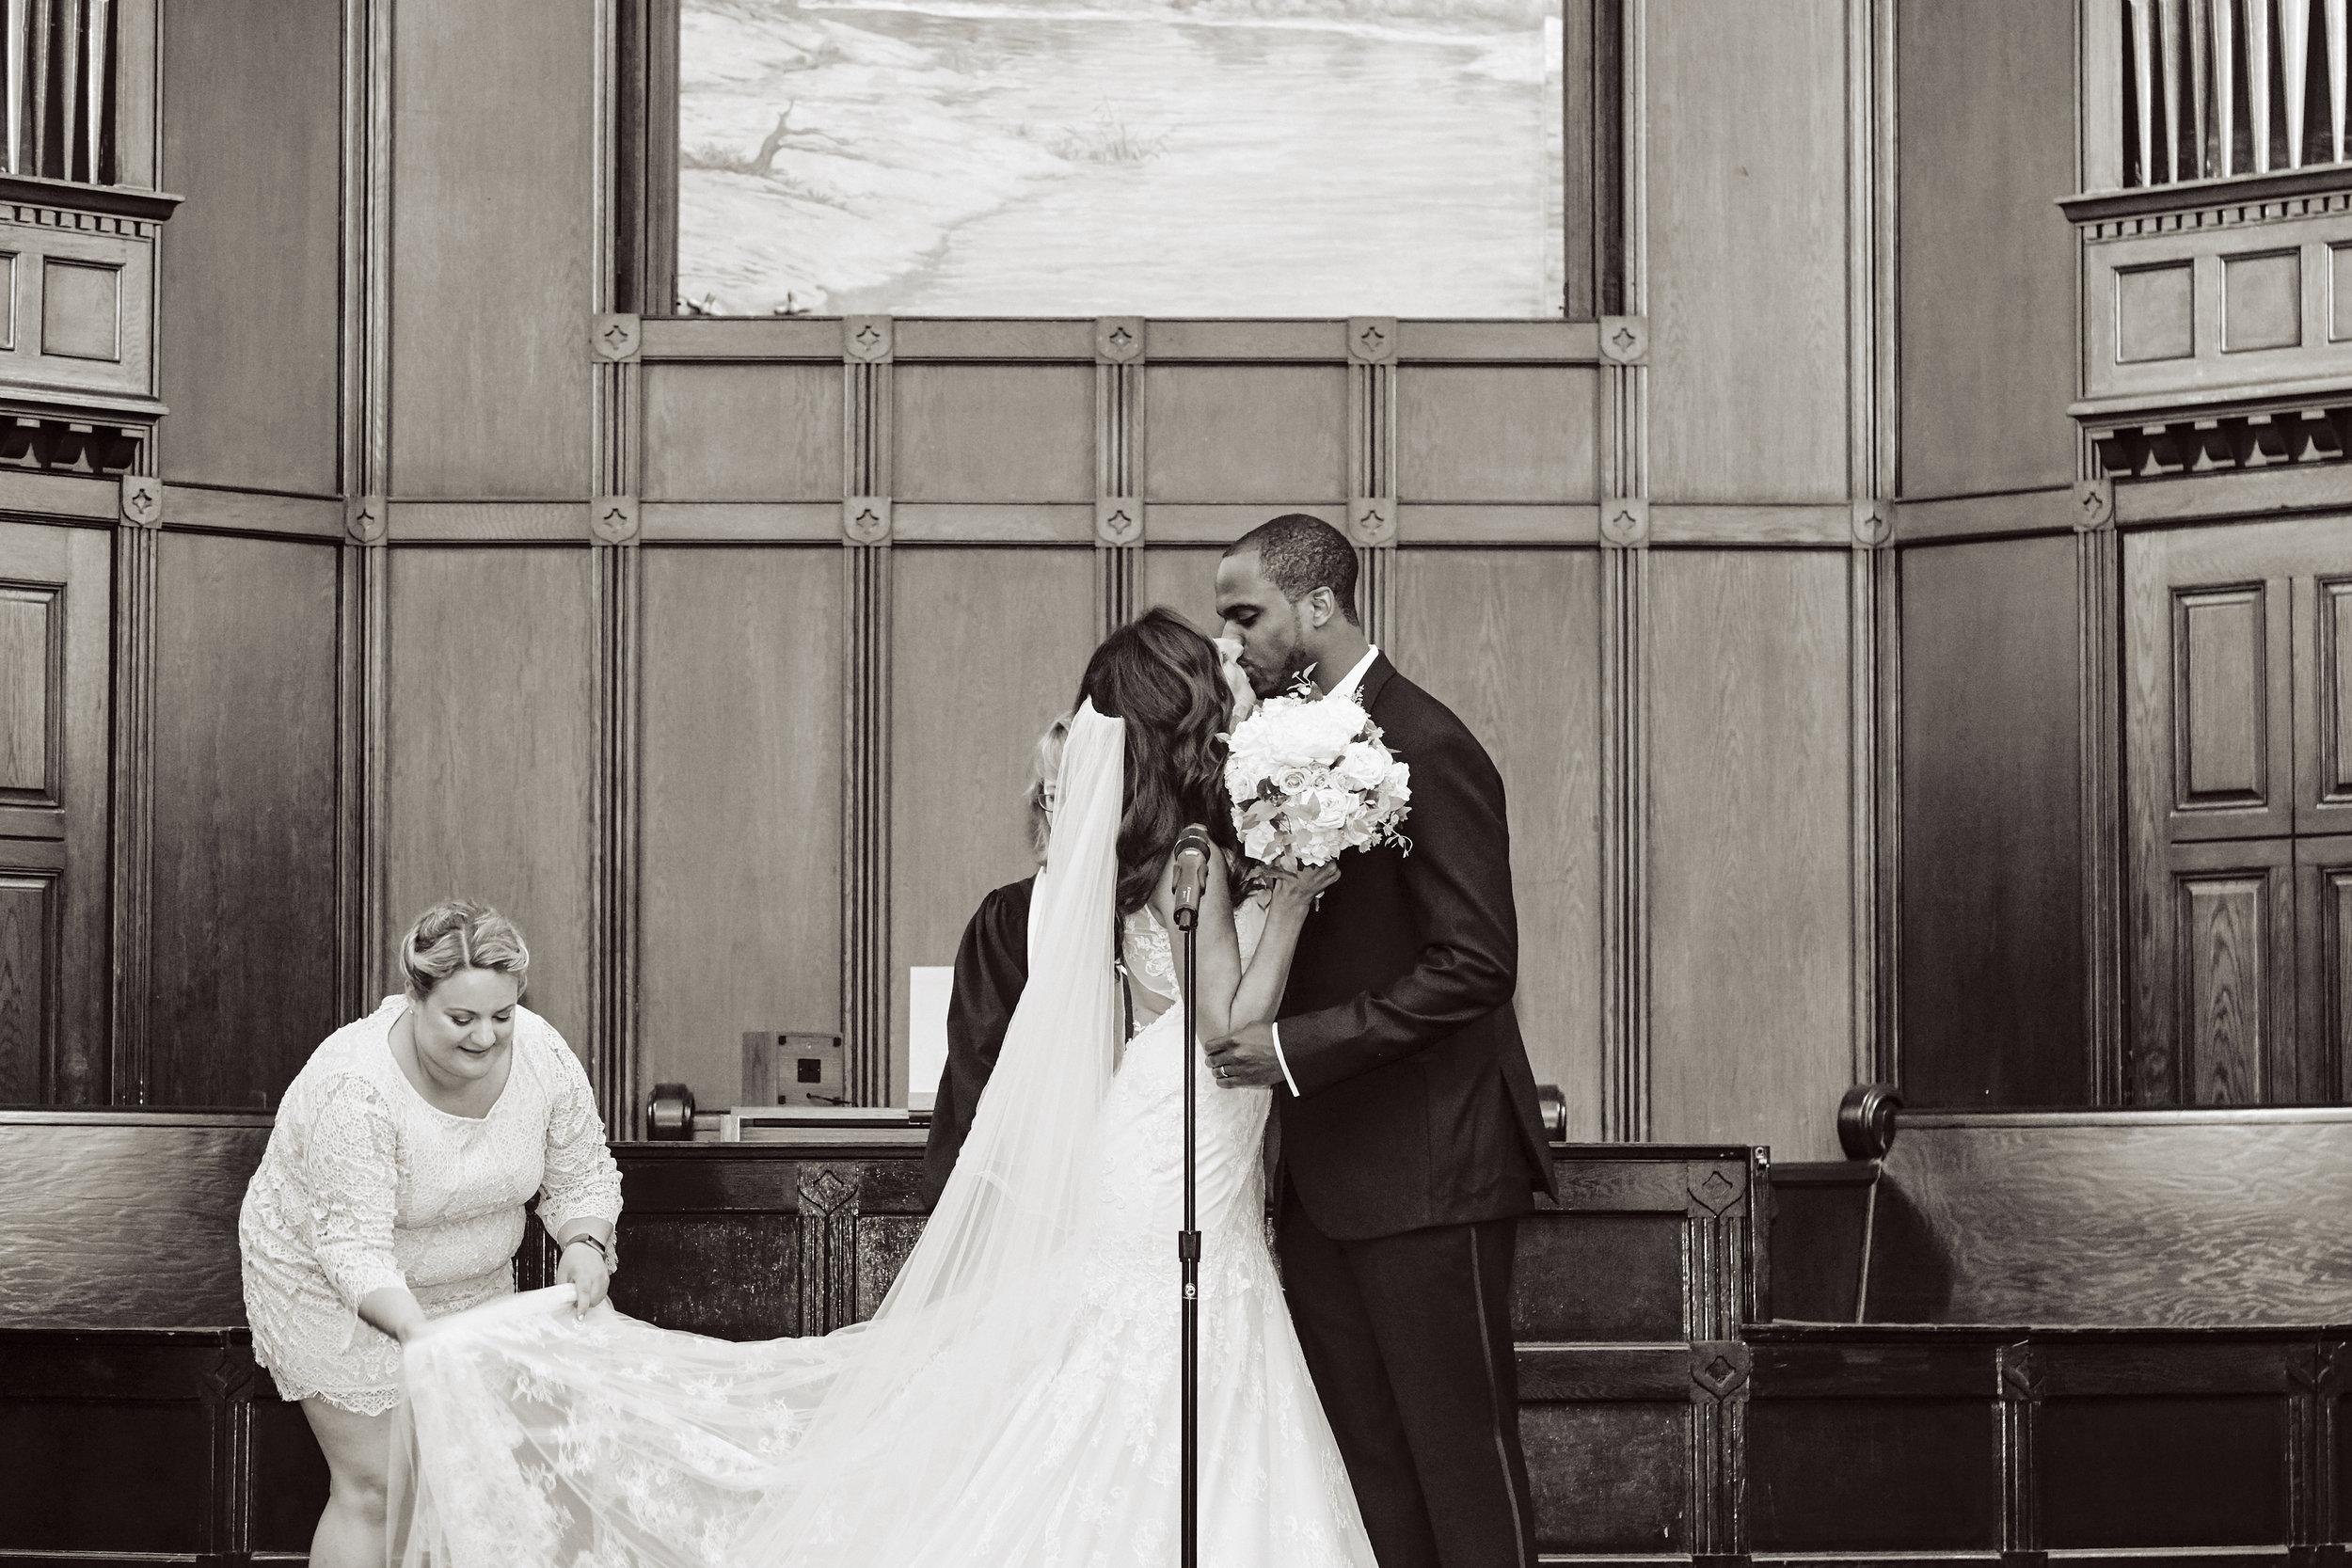 180601_AnnaAdom_CP_Wedding_ 141.jpg